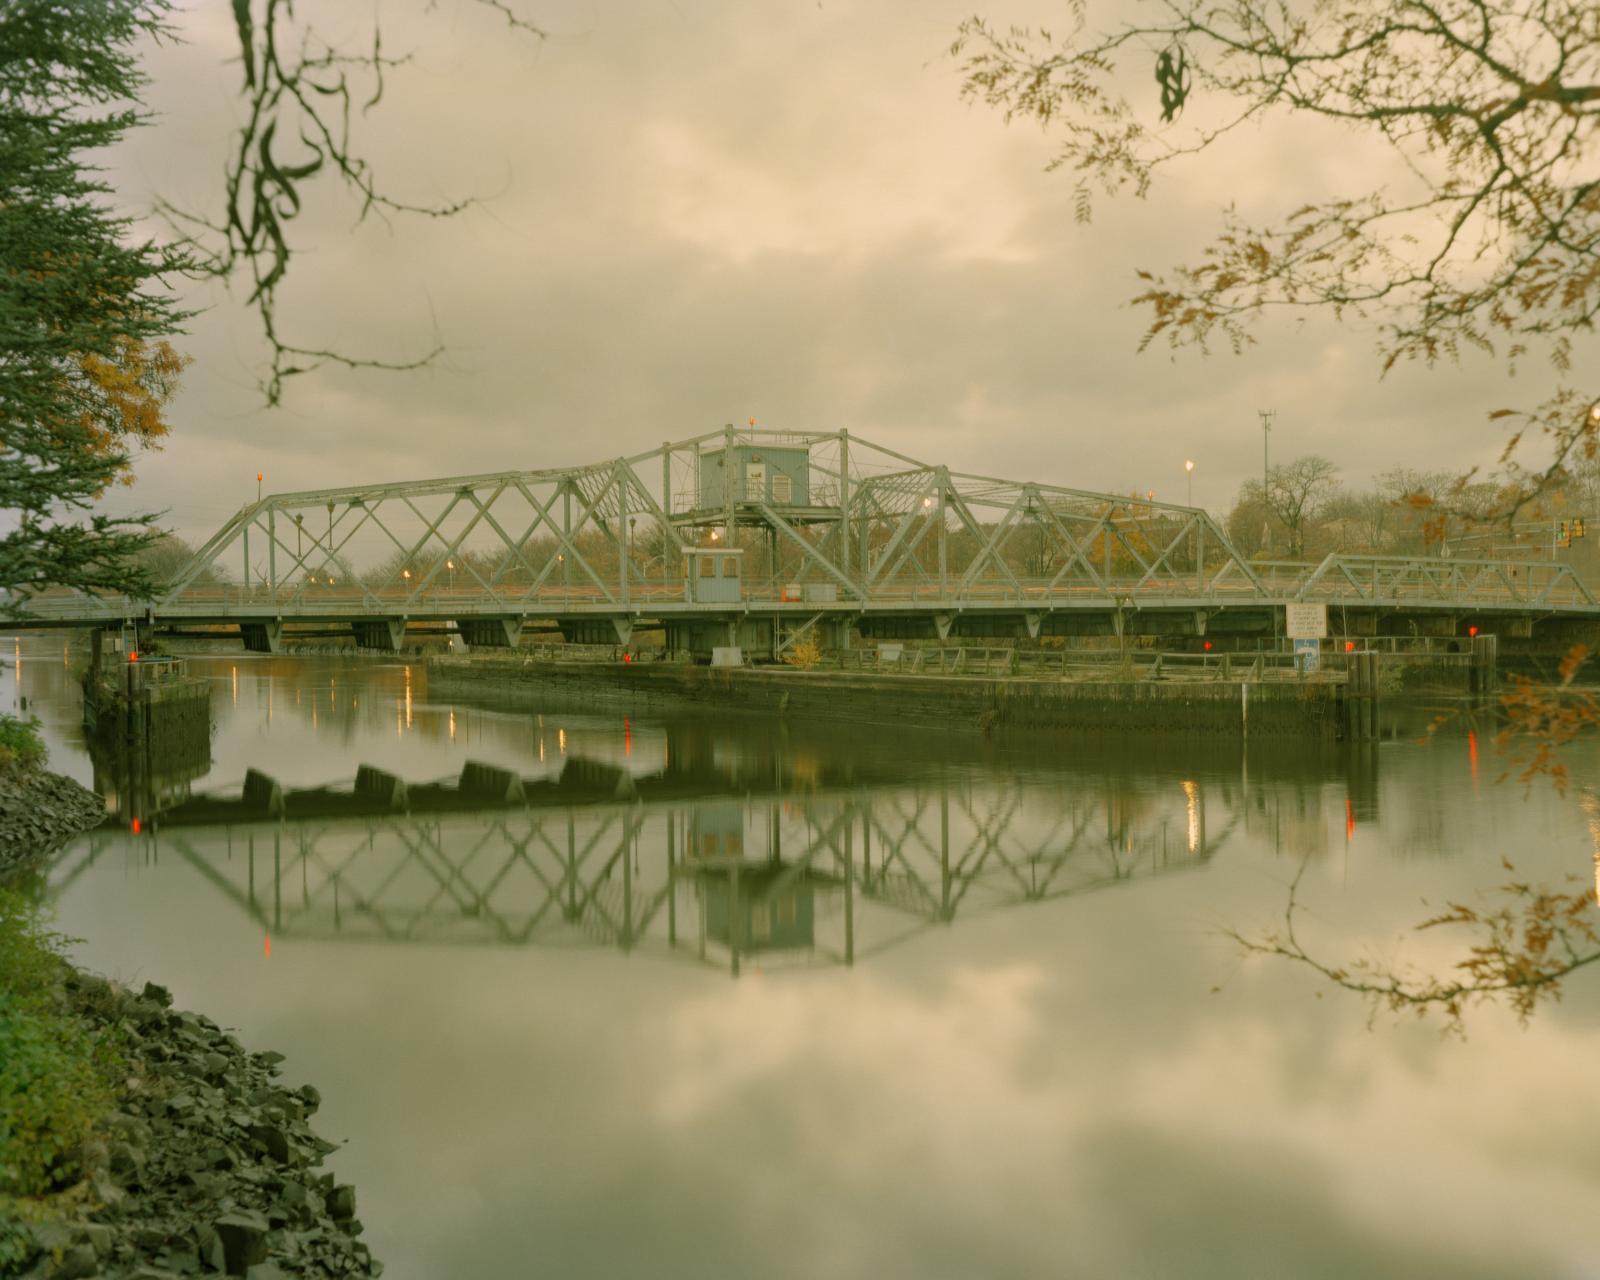 The Joseph Carmine de Jessa Memorial Bridge, Passaic River, Lyndhurst, New Jersey, 2016